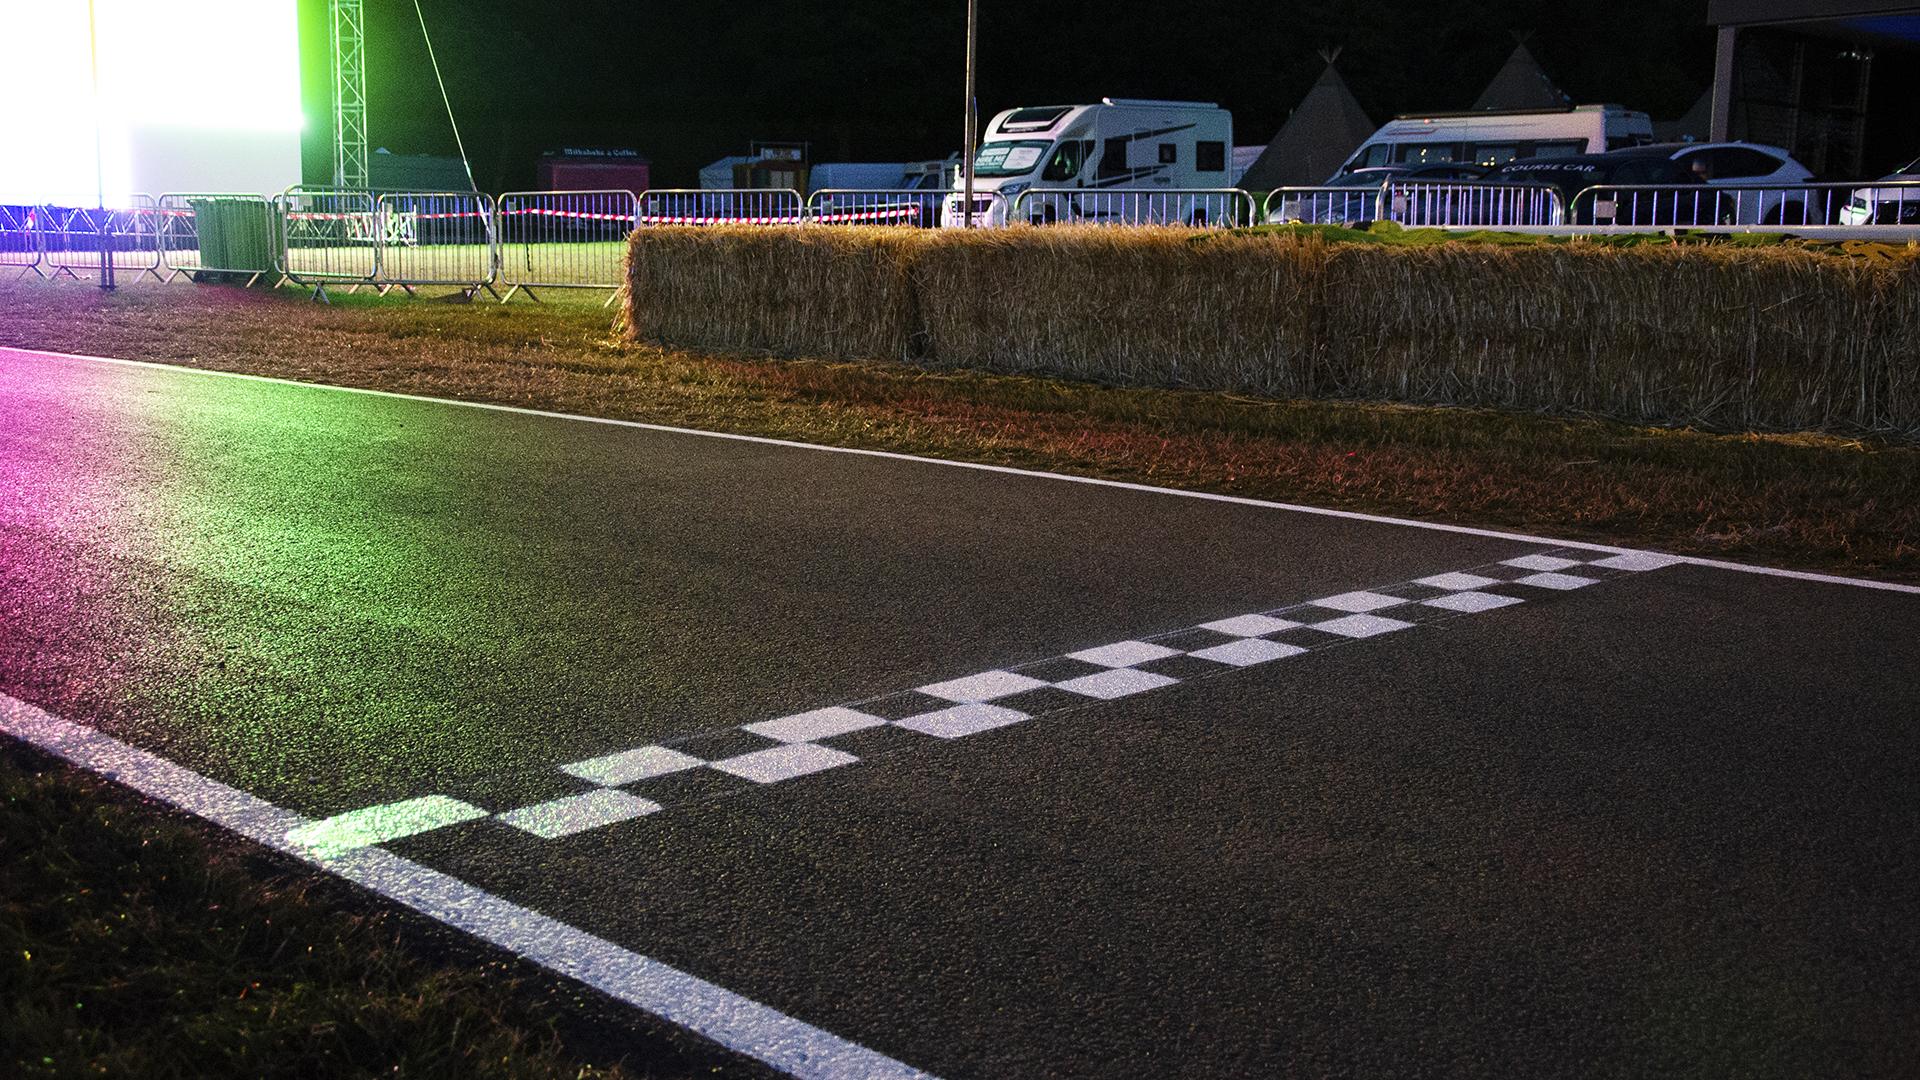 Carfest Road Marking 27